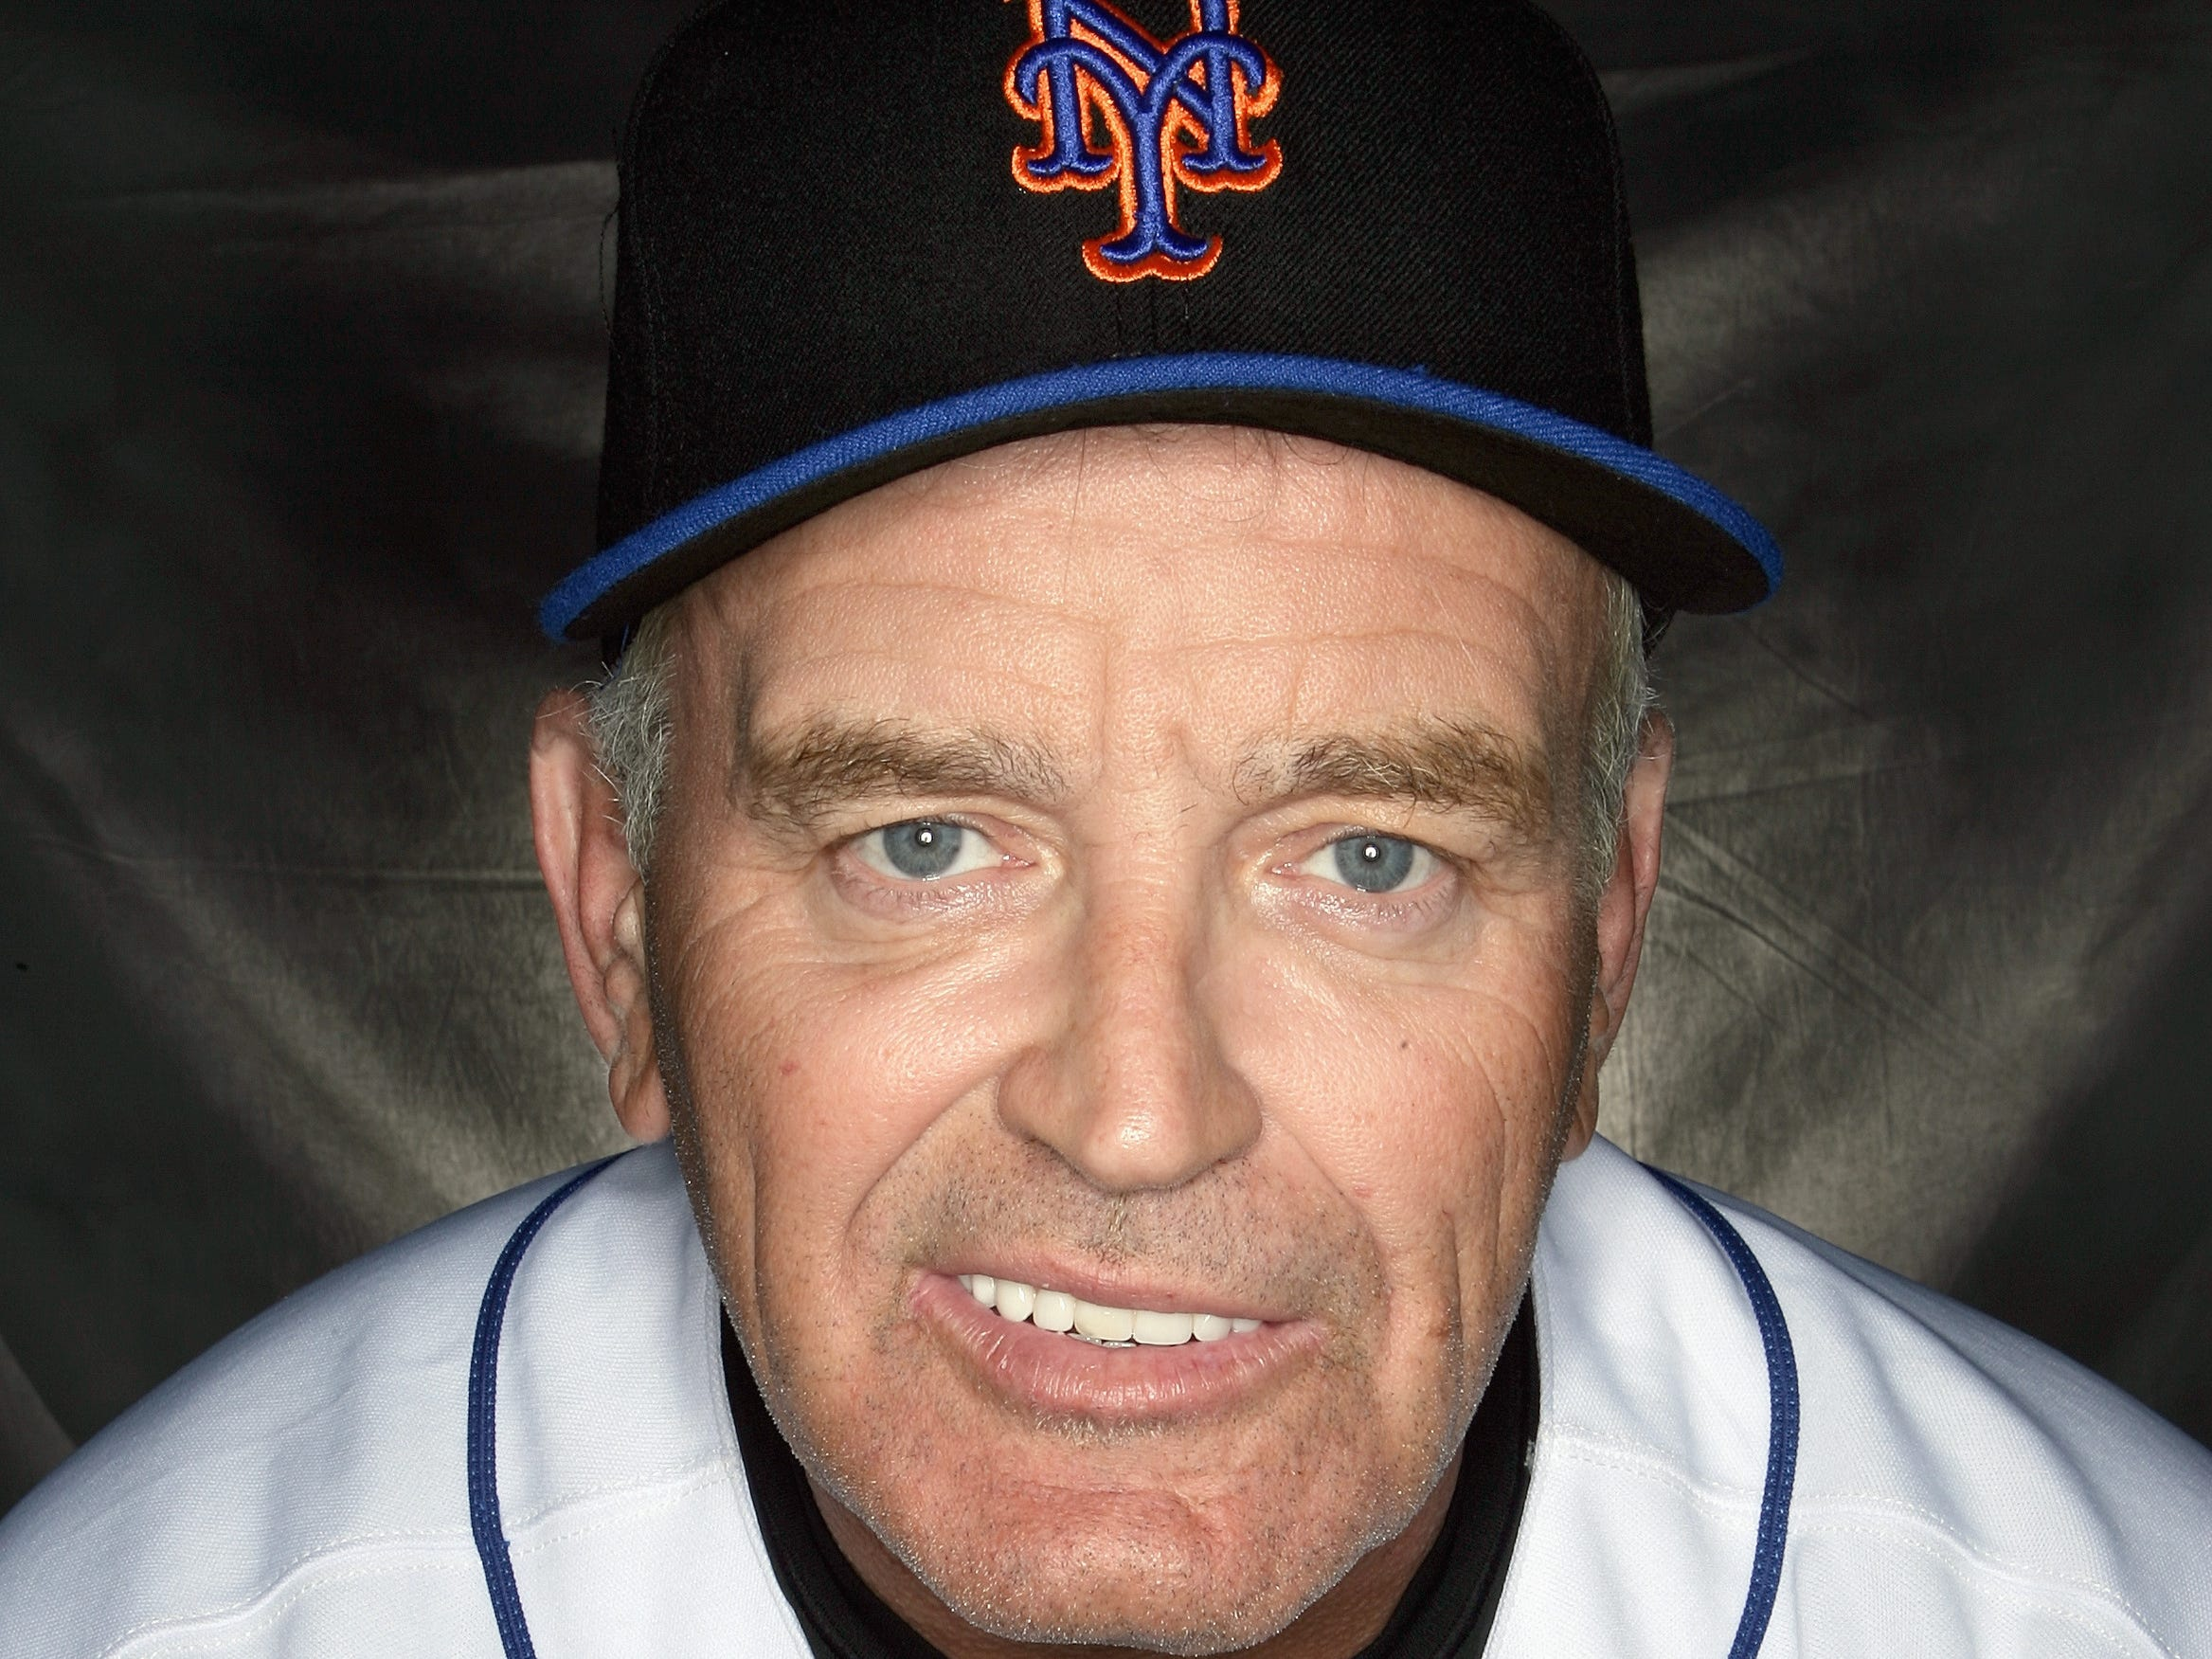 Rick Down, Wyandotte native, major-leaguer and major-league hitting coach for several teams. Jan. 5. He was 68.